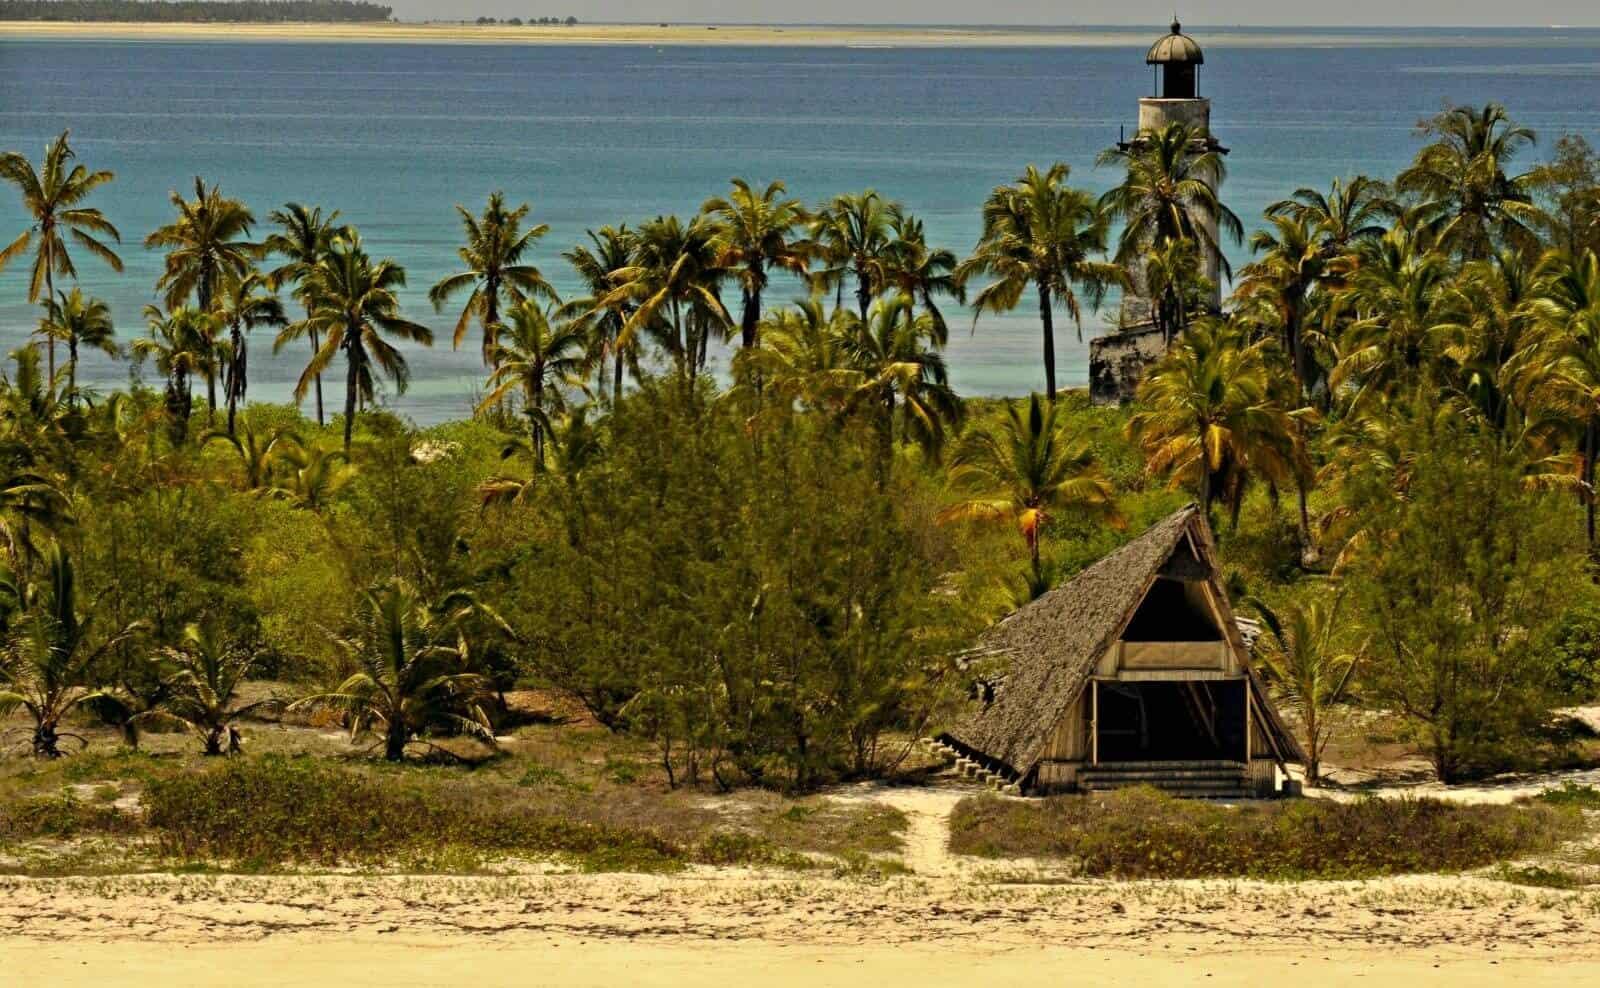 tansania_fanjove-island-landschaft